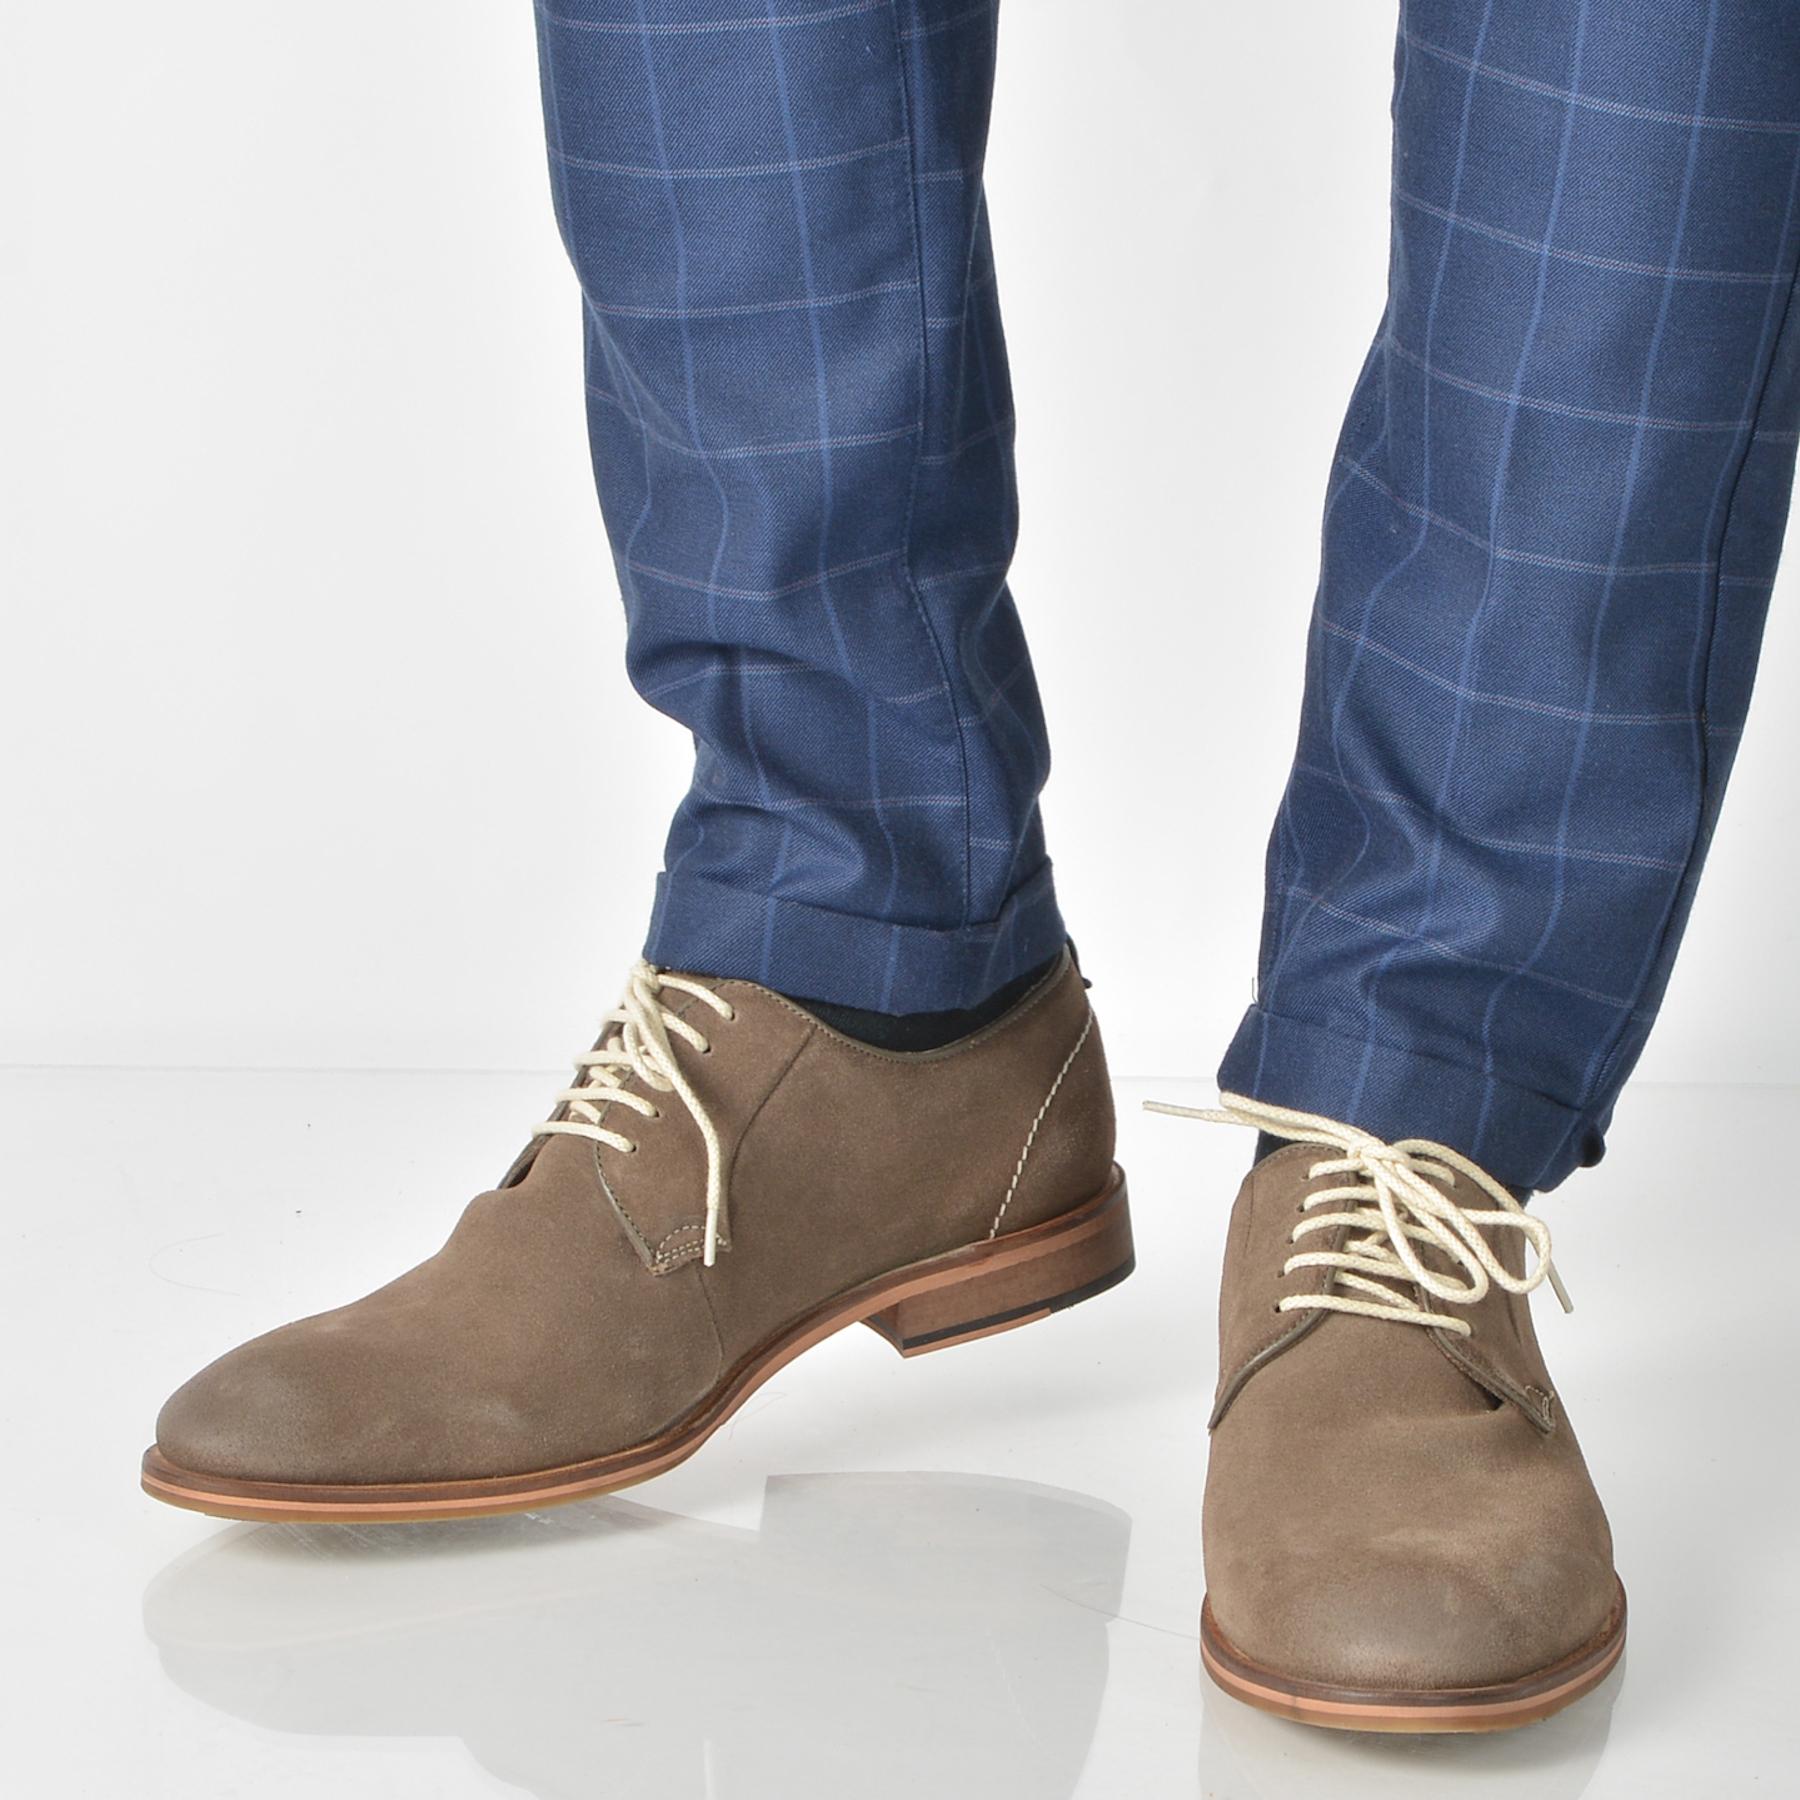 Pantofi OTTER maro, 4132, din piele intoarsa